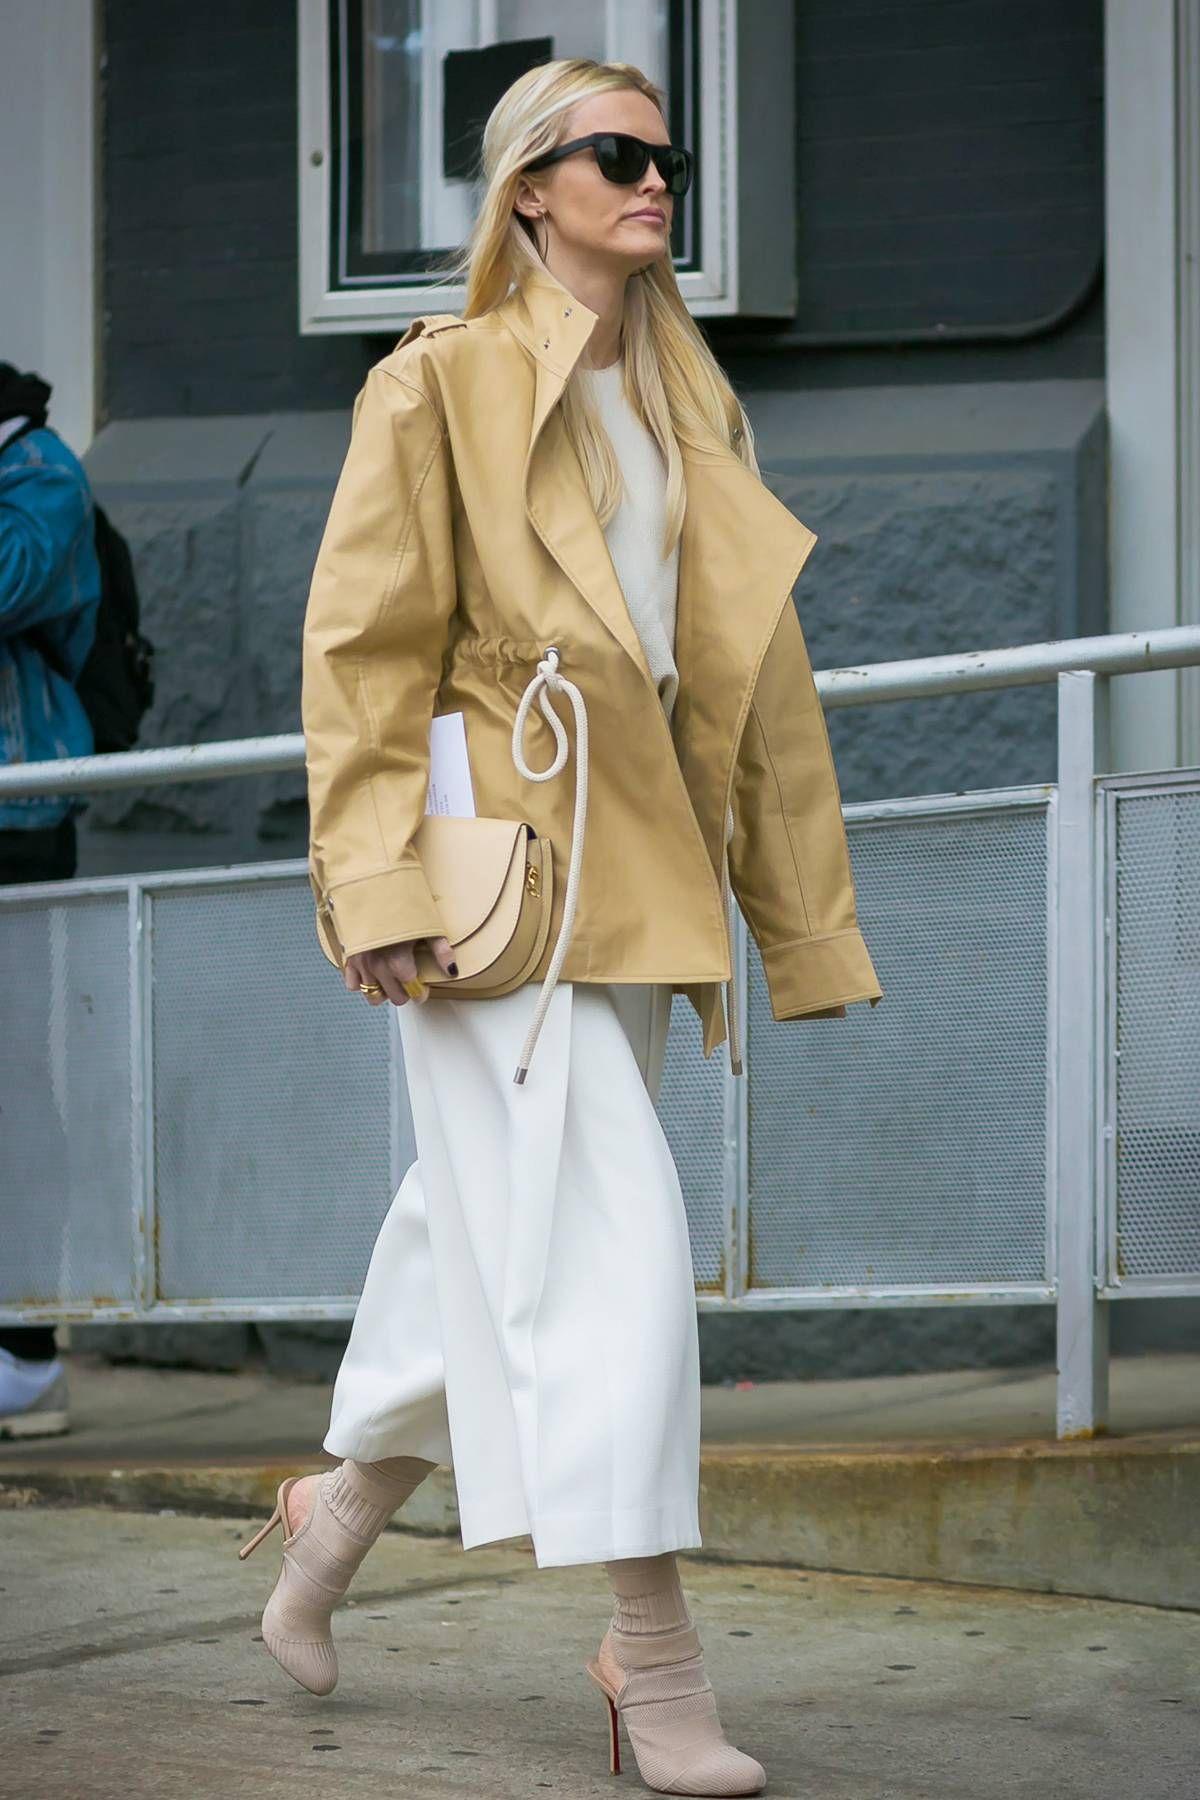 Wedding madonna dress, How to wide wear leg linen trousers